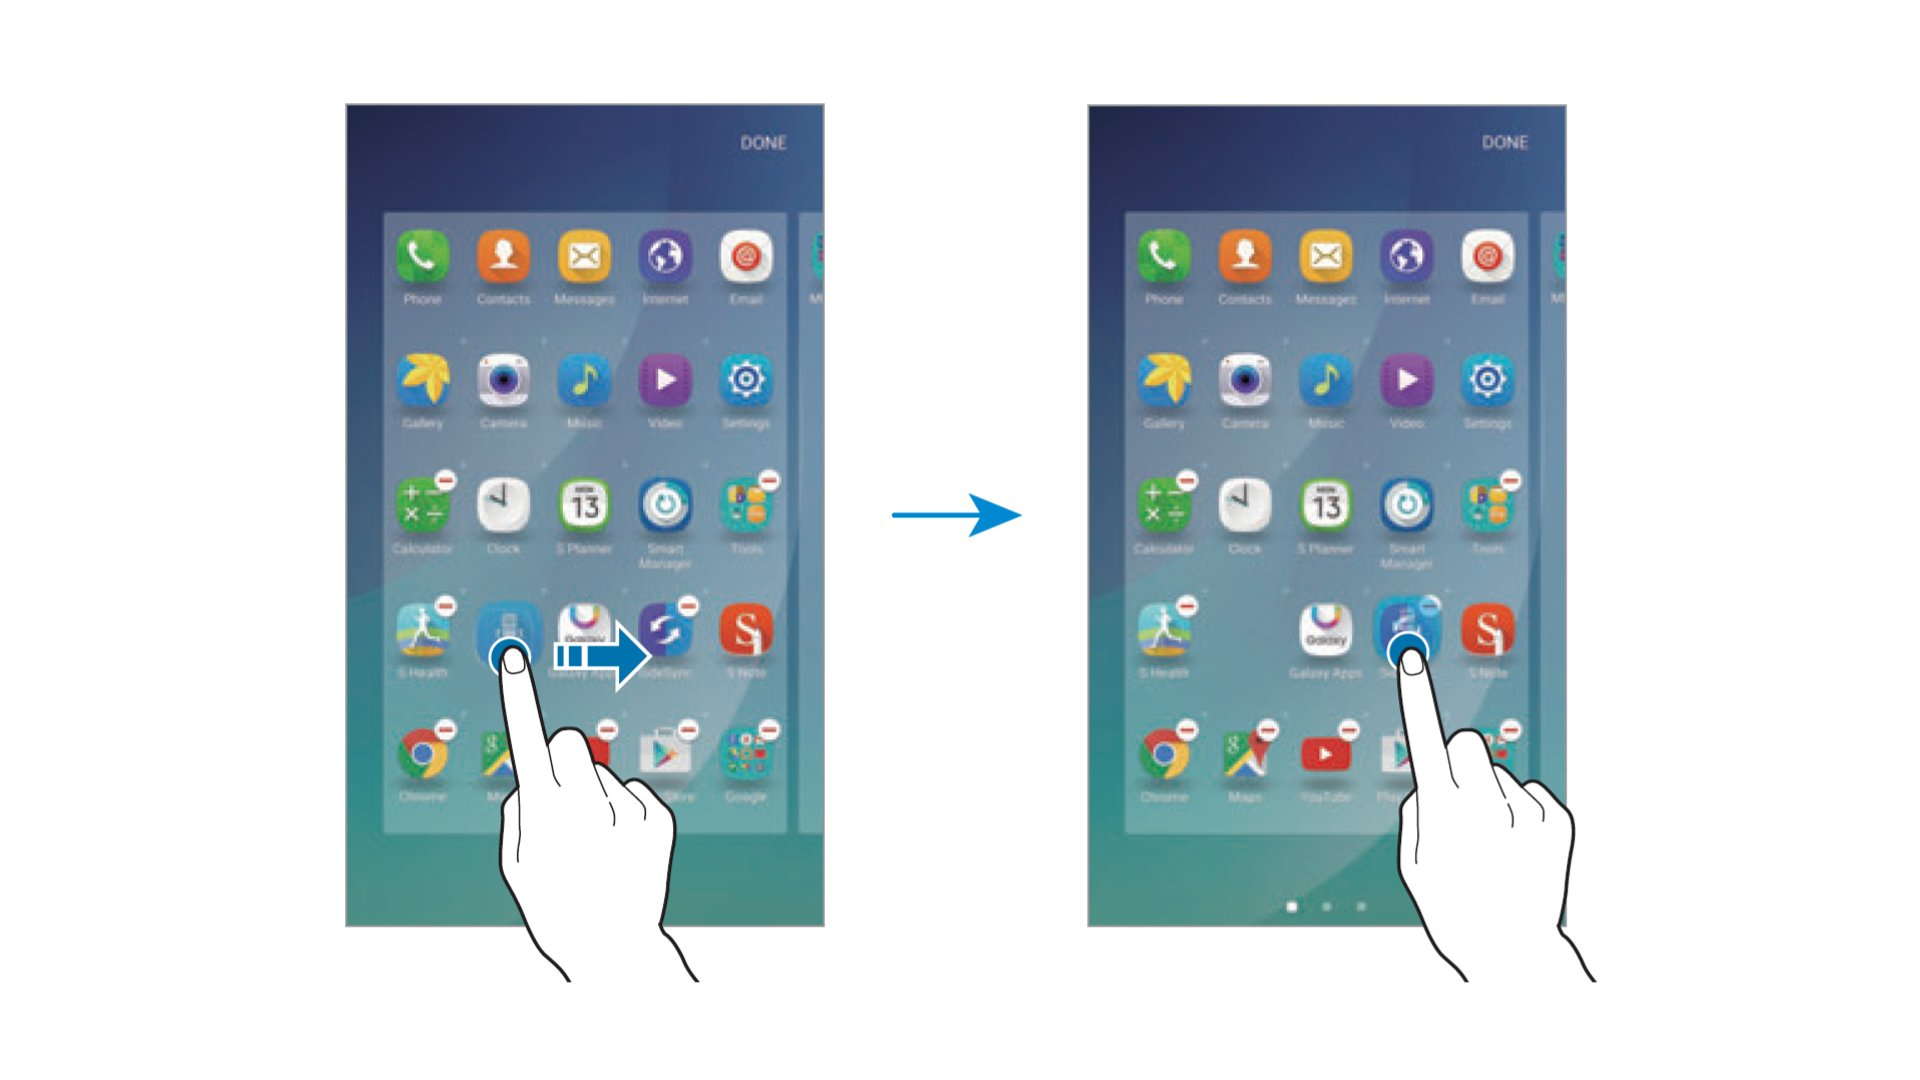 Samsung Galaxy Note 5 - Creating Folders In App Screen